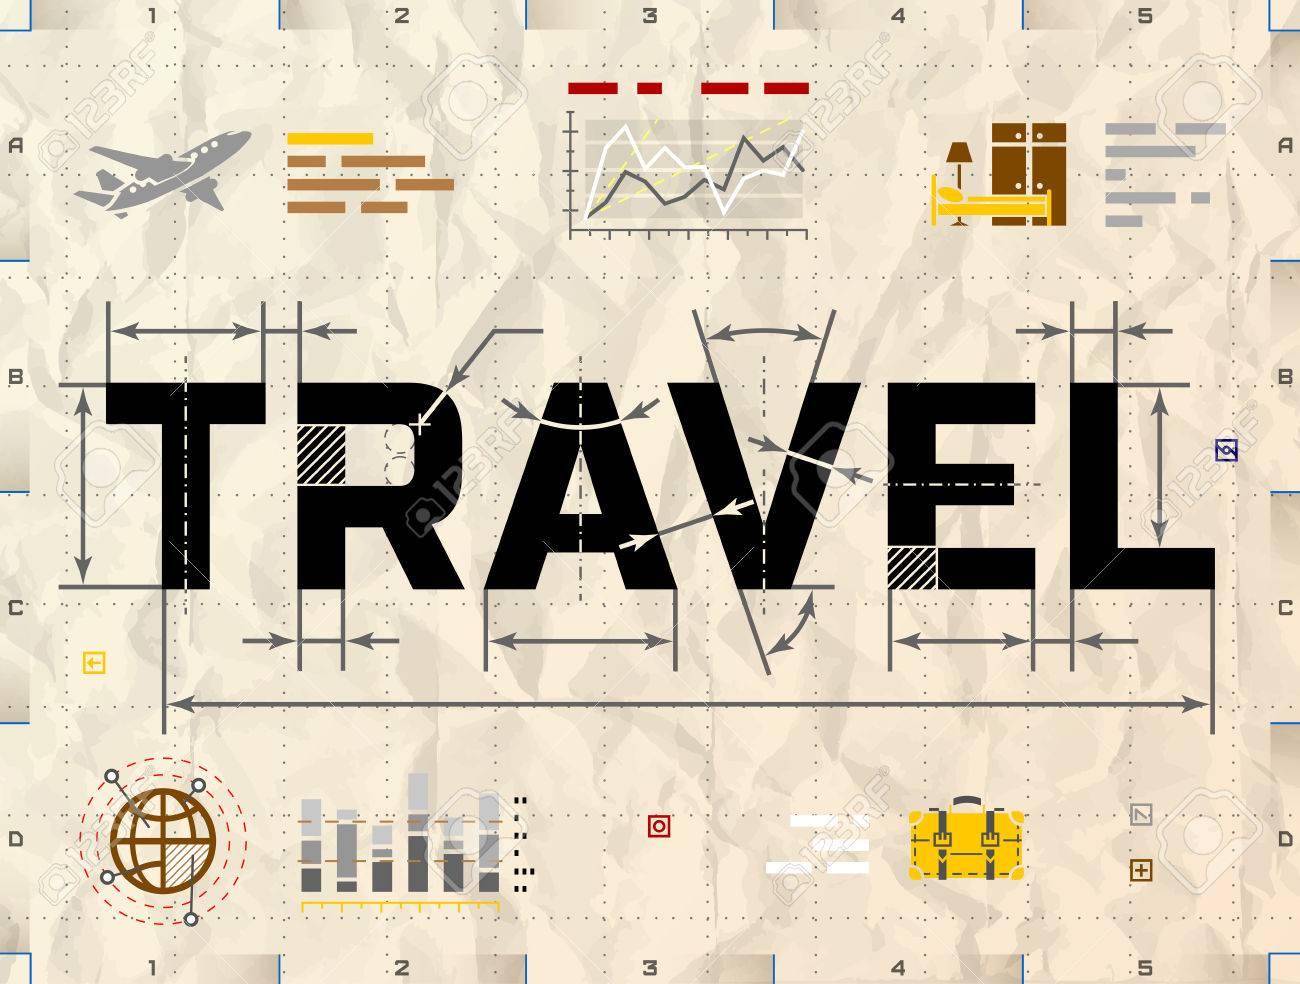 Word travel as technical blueprint drawing drafting of tourism word travel as technical blueprint drawing drafting of tourism on crumpled paper qualitative illustration malvernweather Choice Image